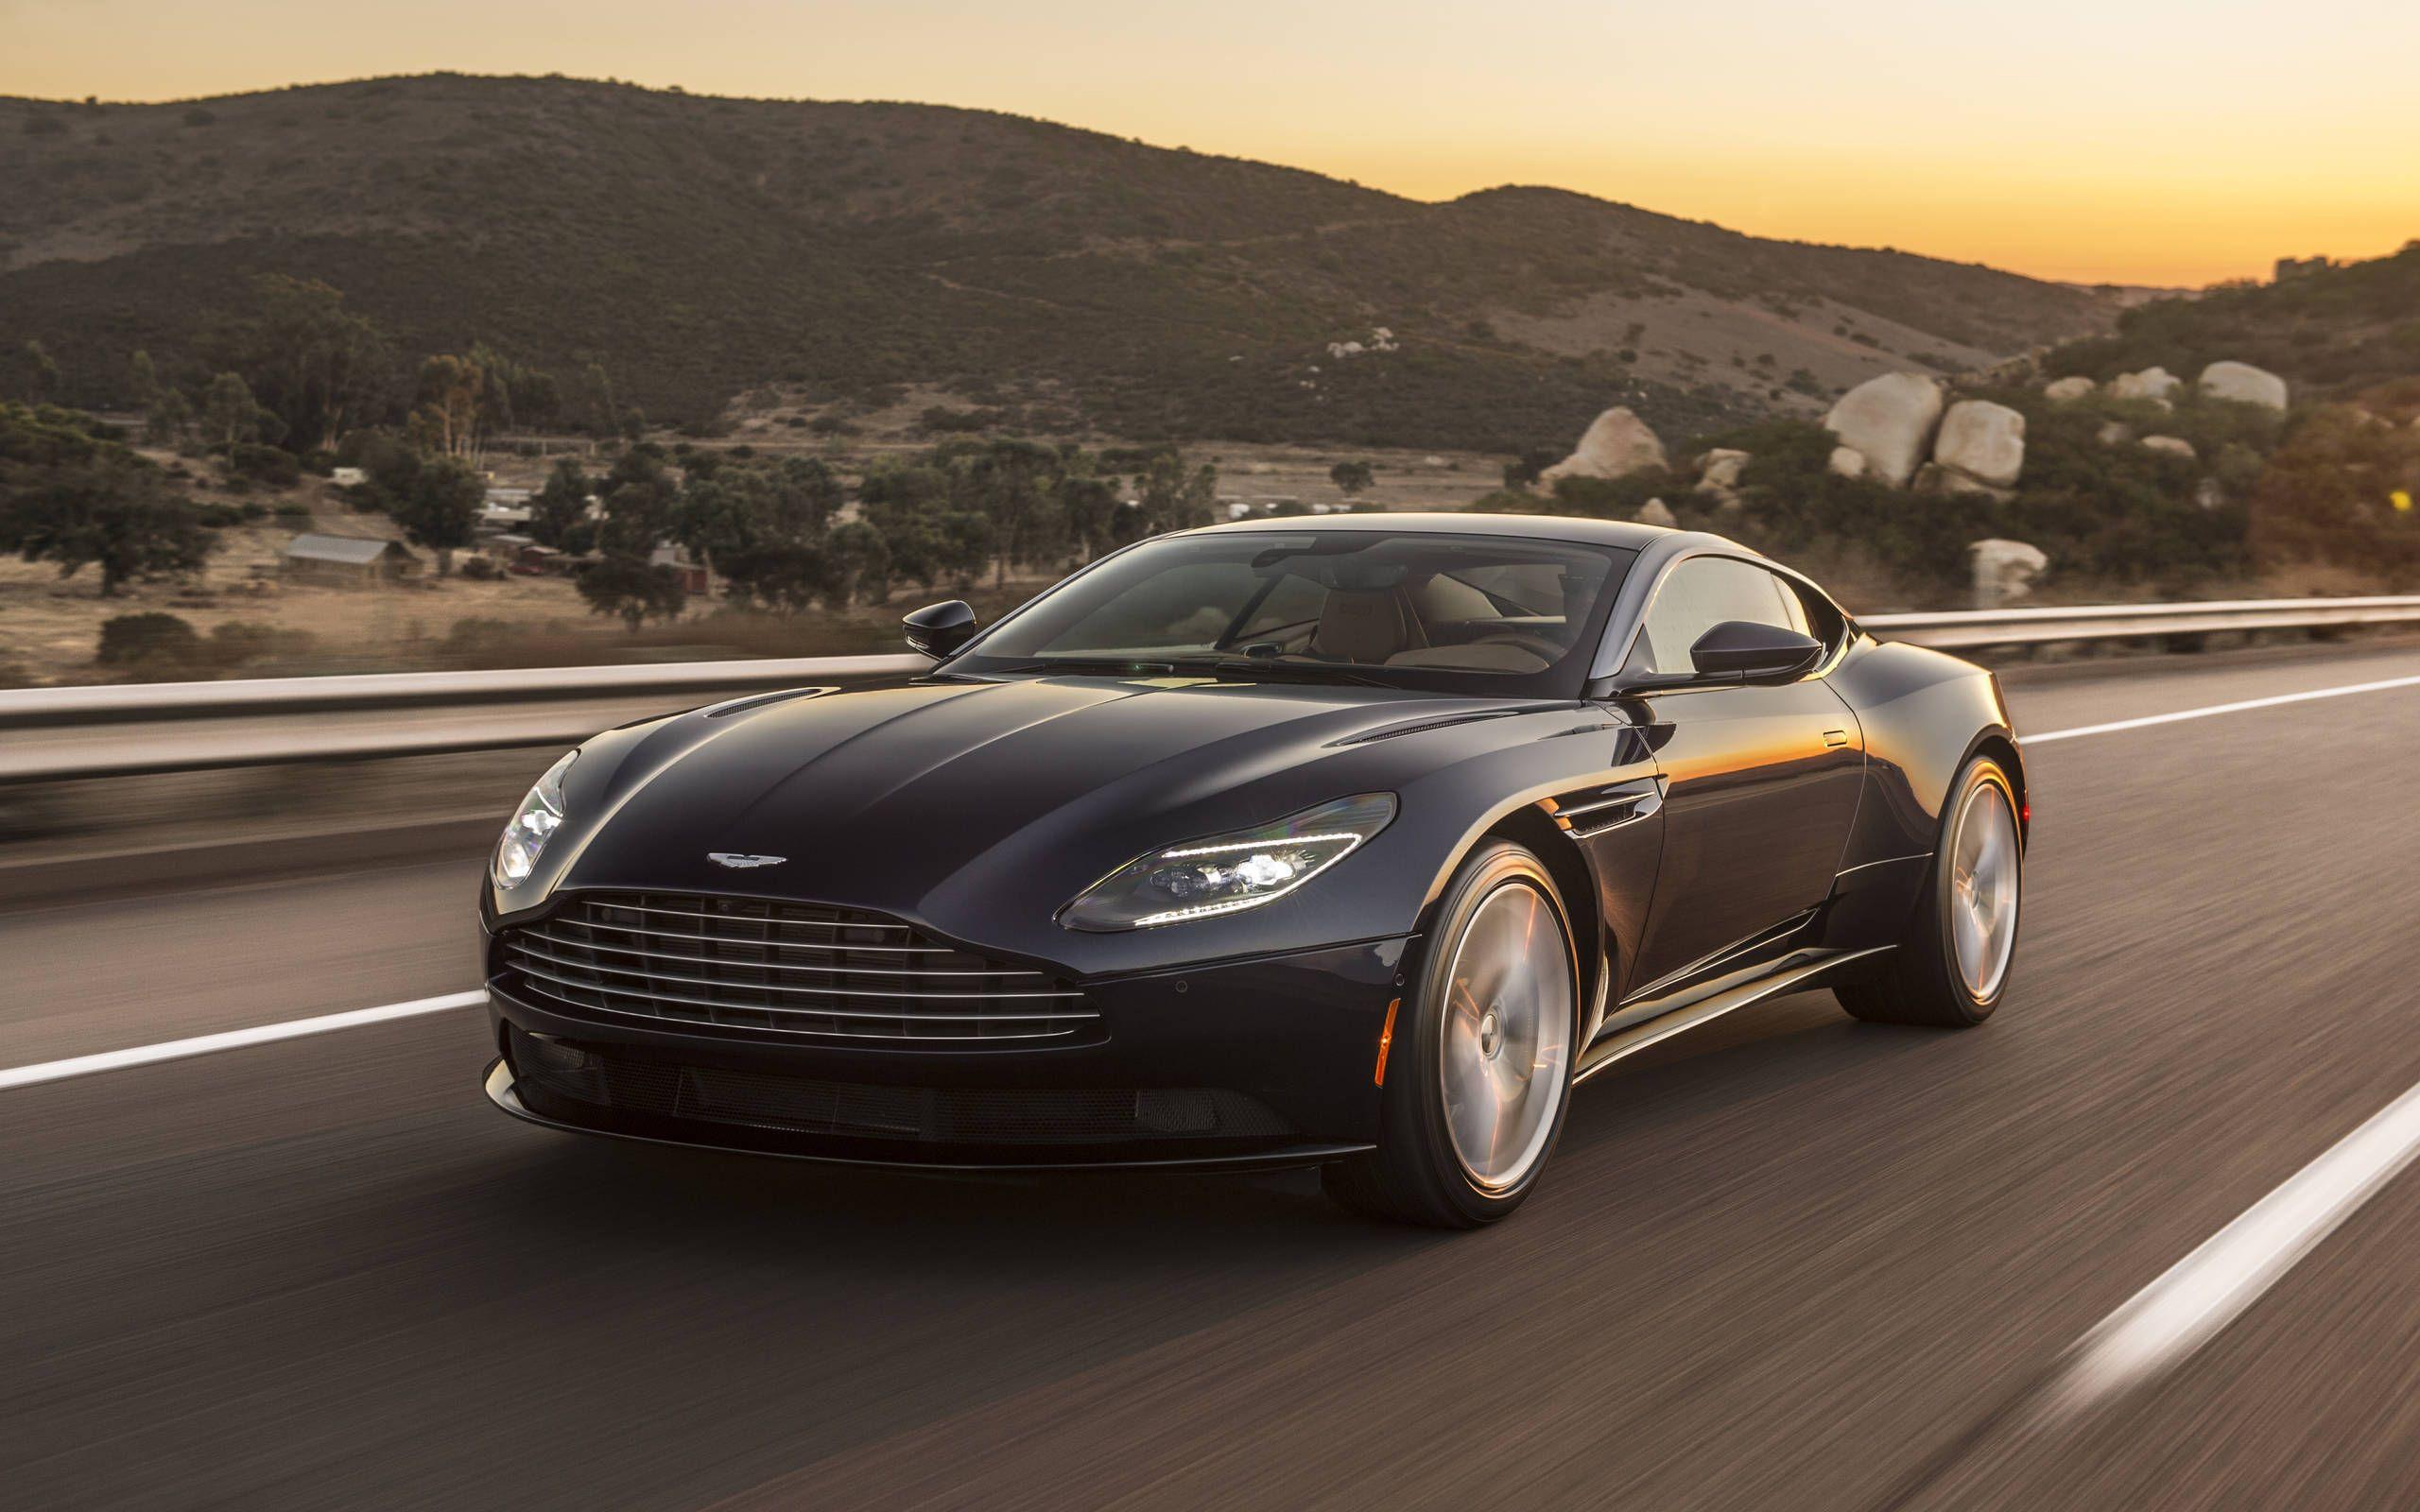 2018 Aston Martin Db11 V8 First Drive Lighter Is Always Better